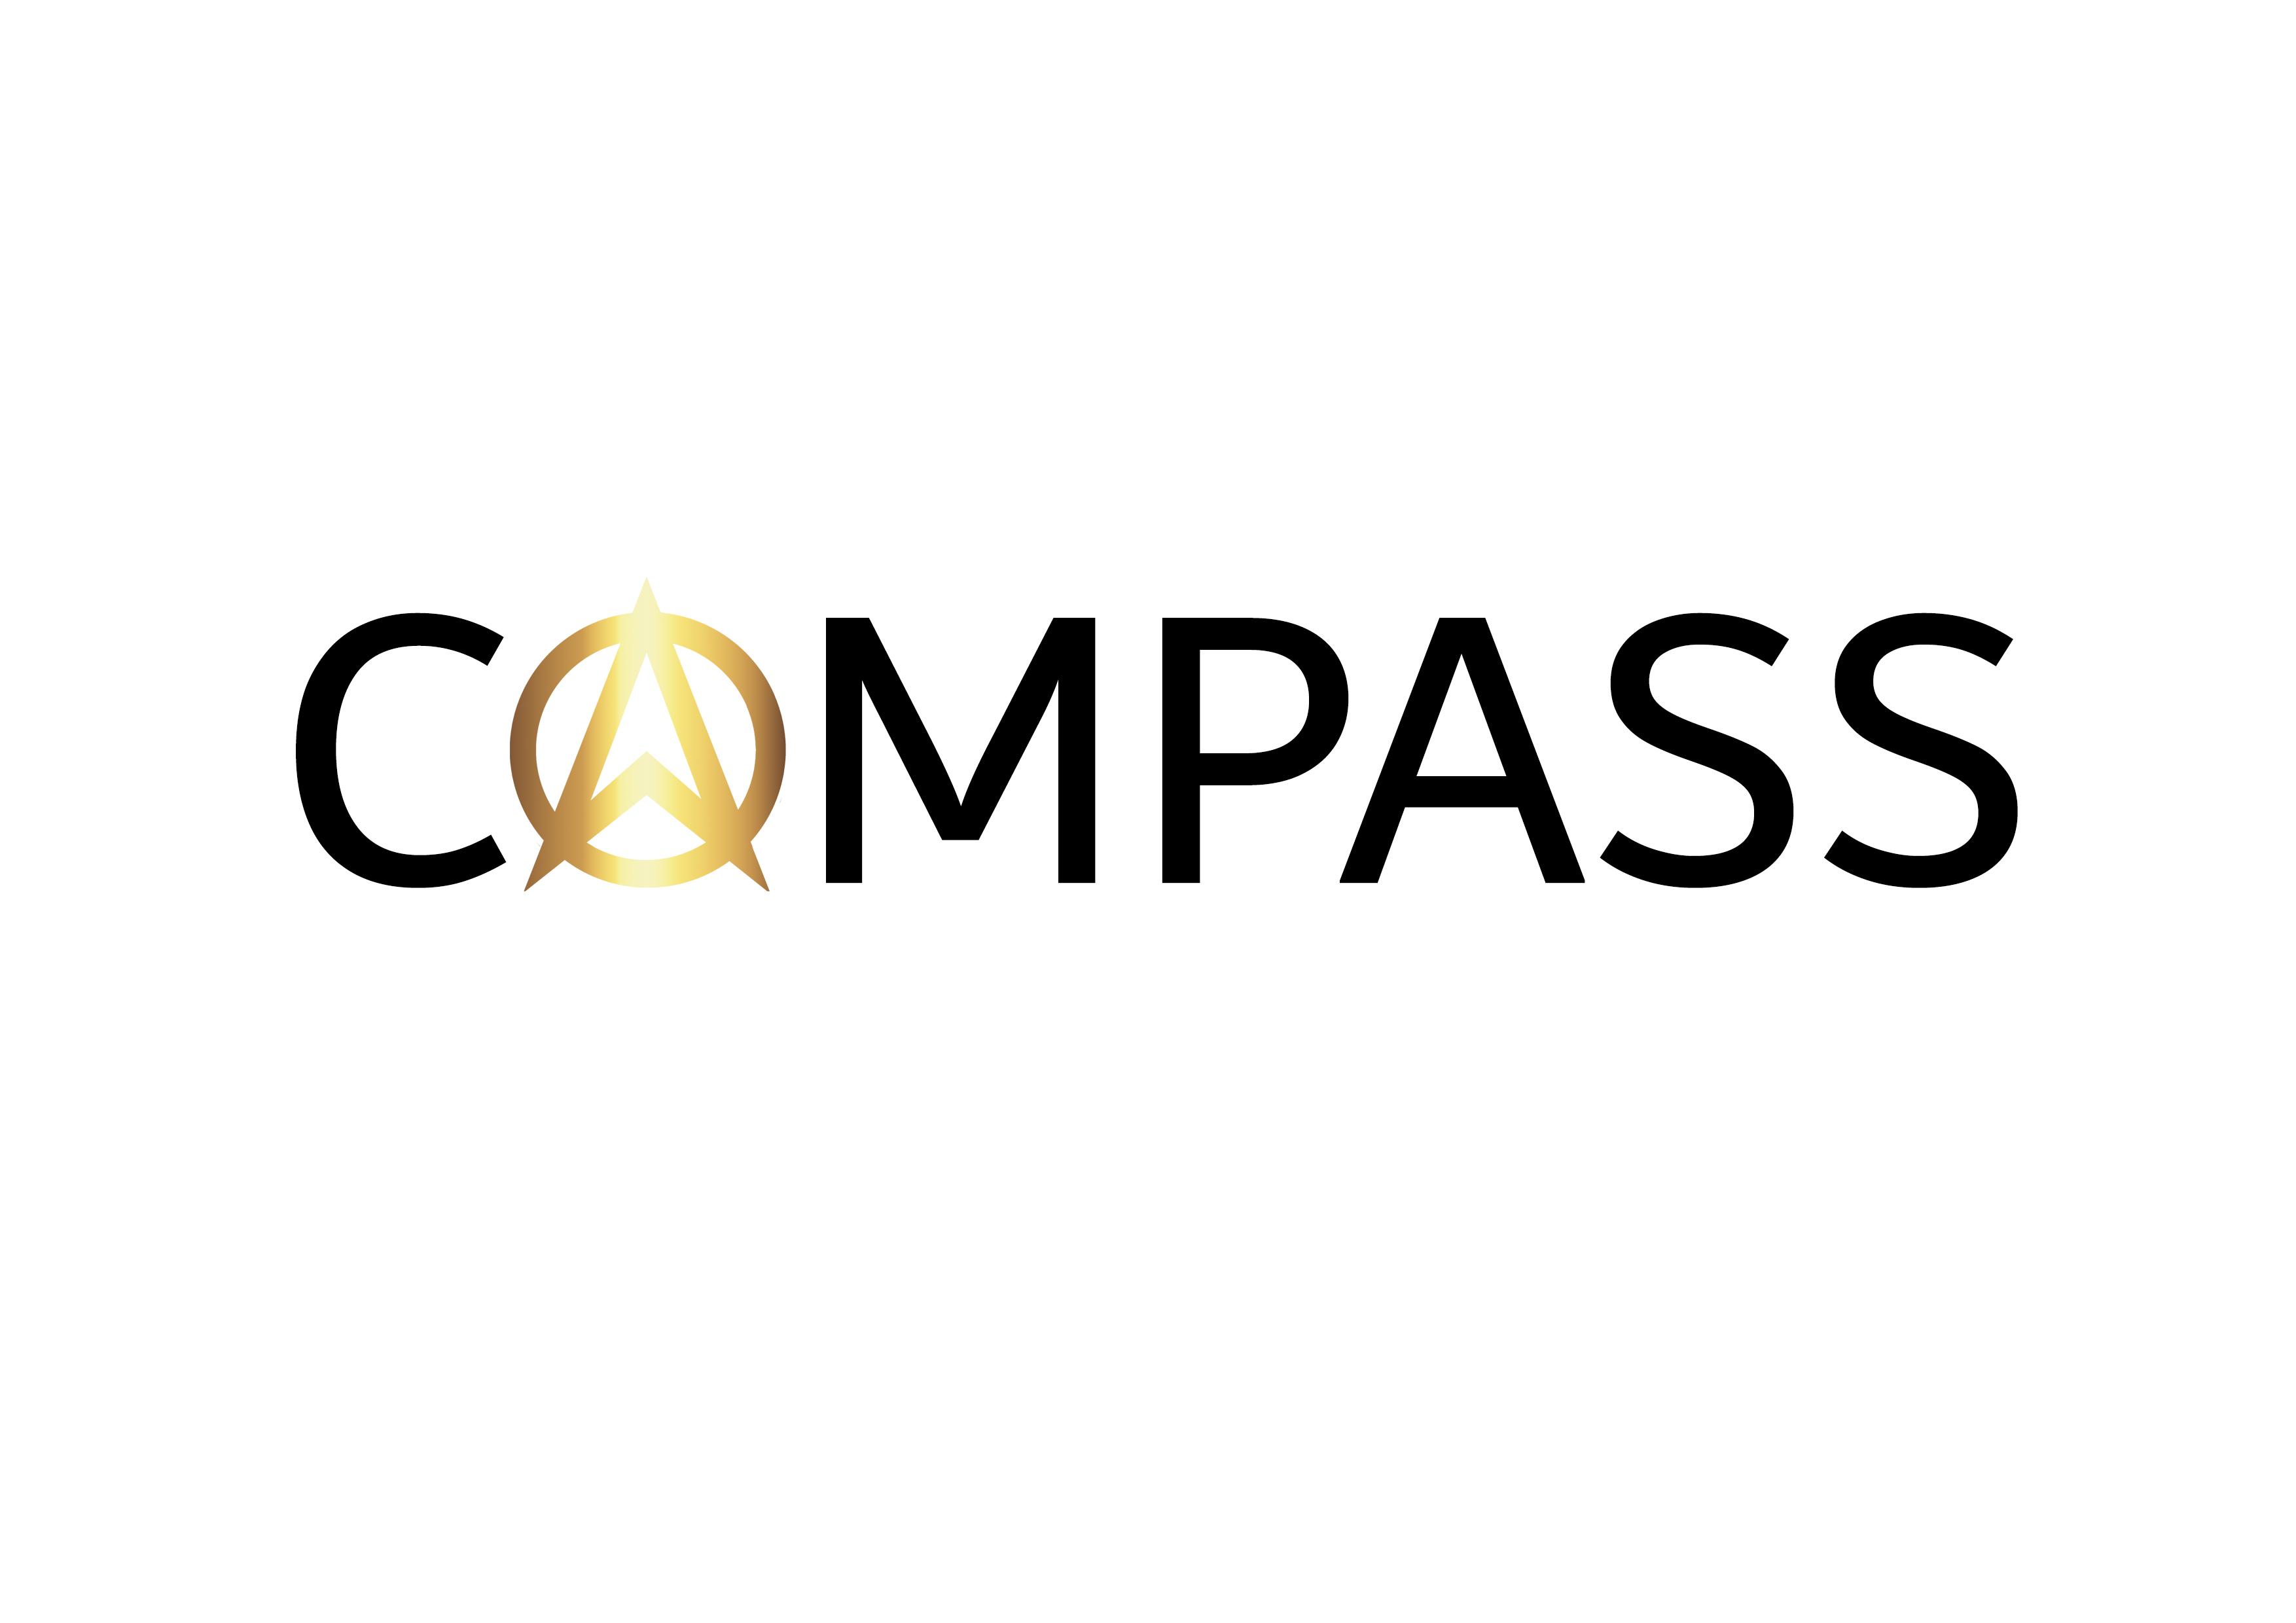 Team Compass